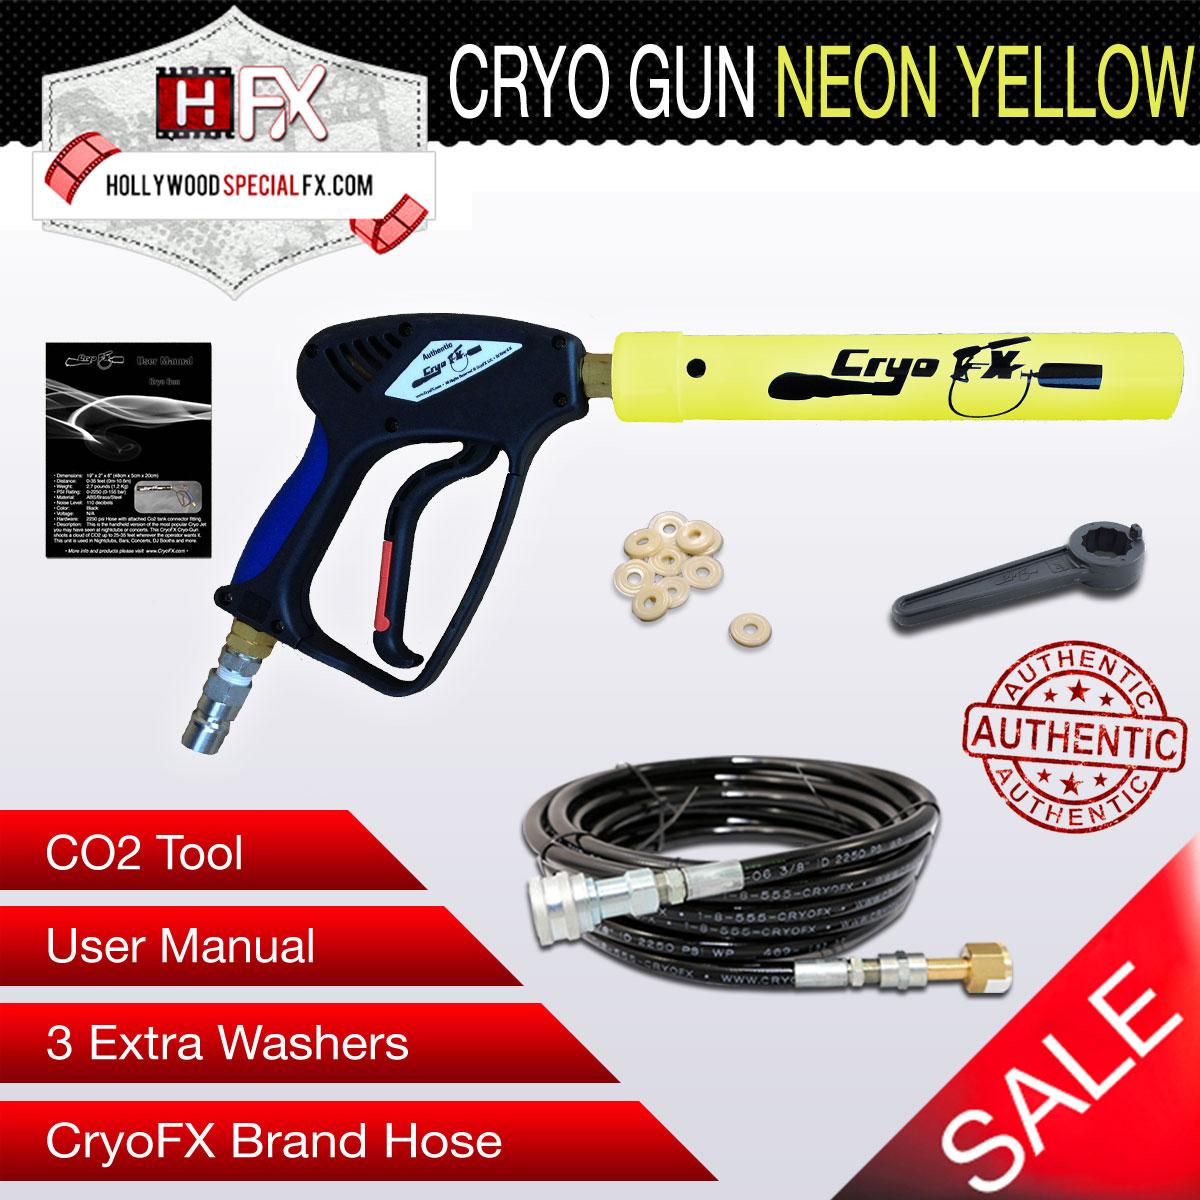 Cryo Gun Neon Yellow